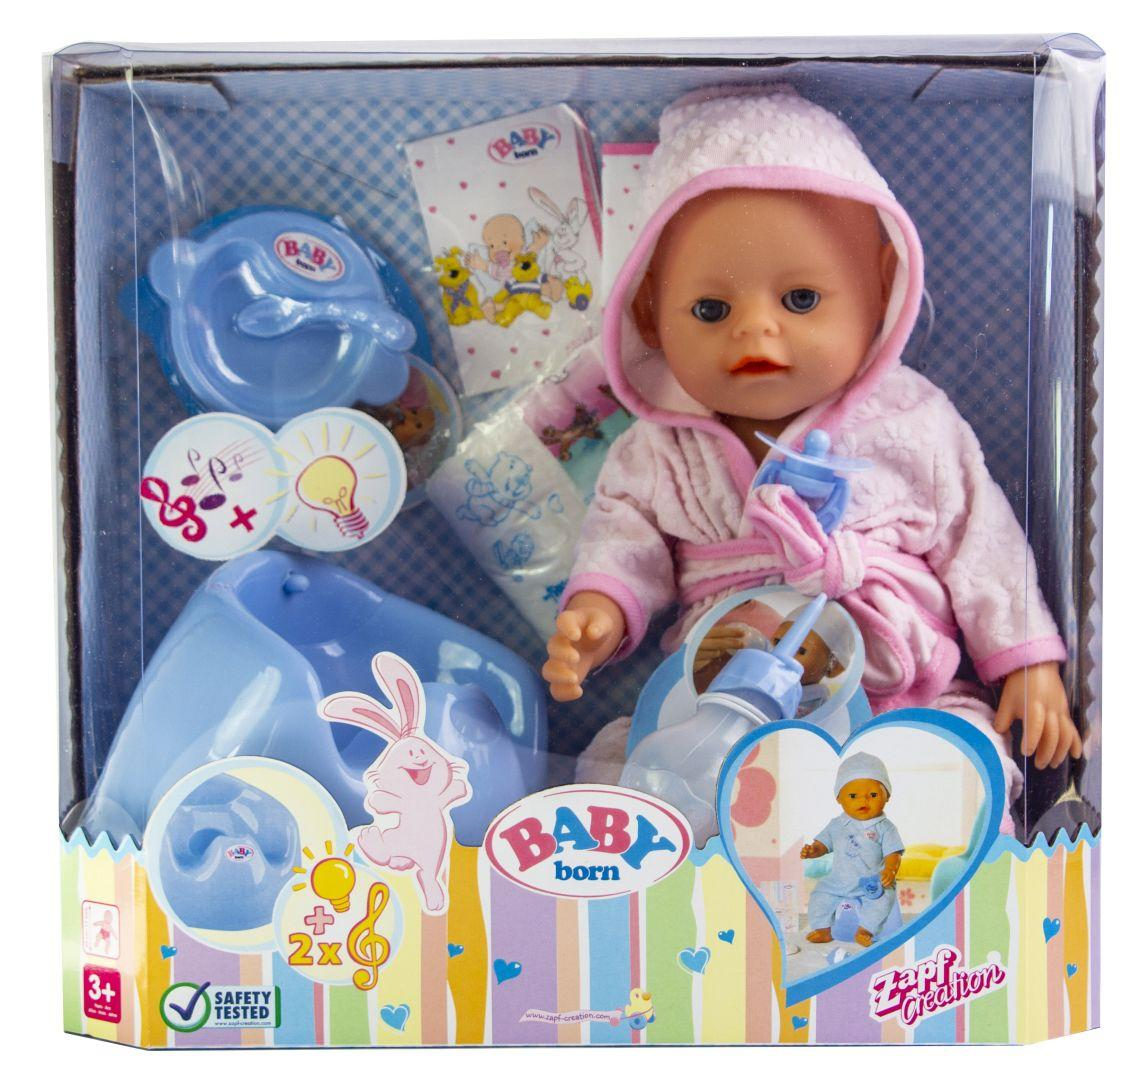 Кукла Baby Born (Бейби Борн) с аксессуарами, музыкальный горшок (K152)